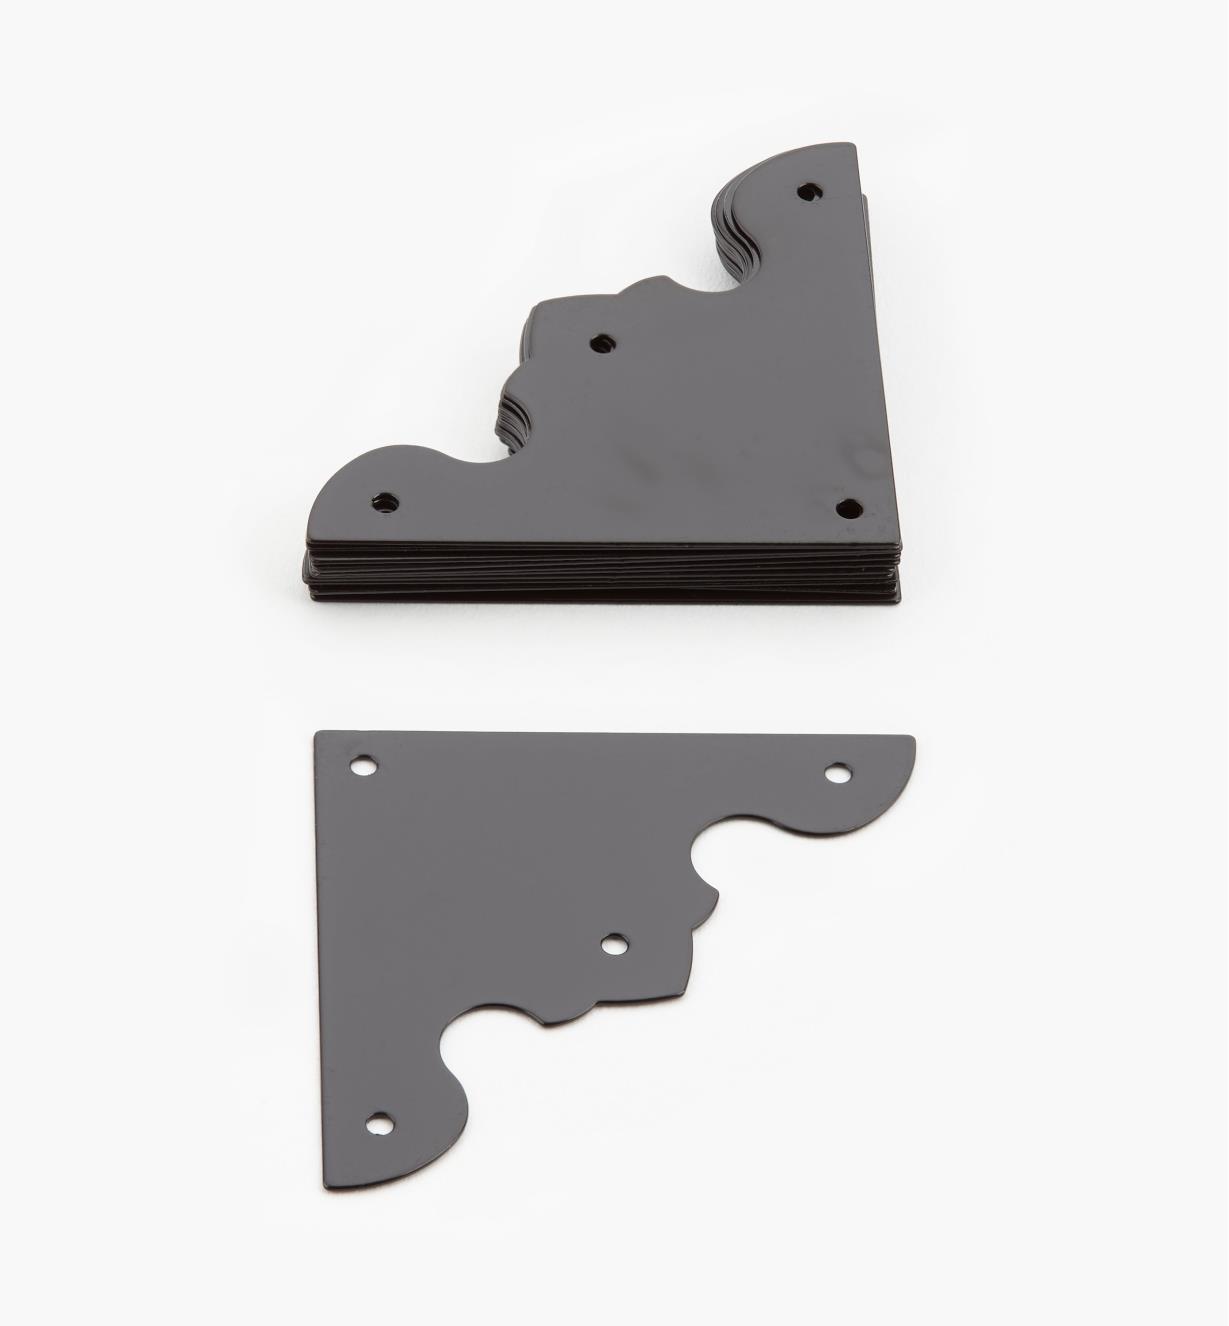 00D5512 - 41mm Corner Plates, pkg. of 12